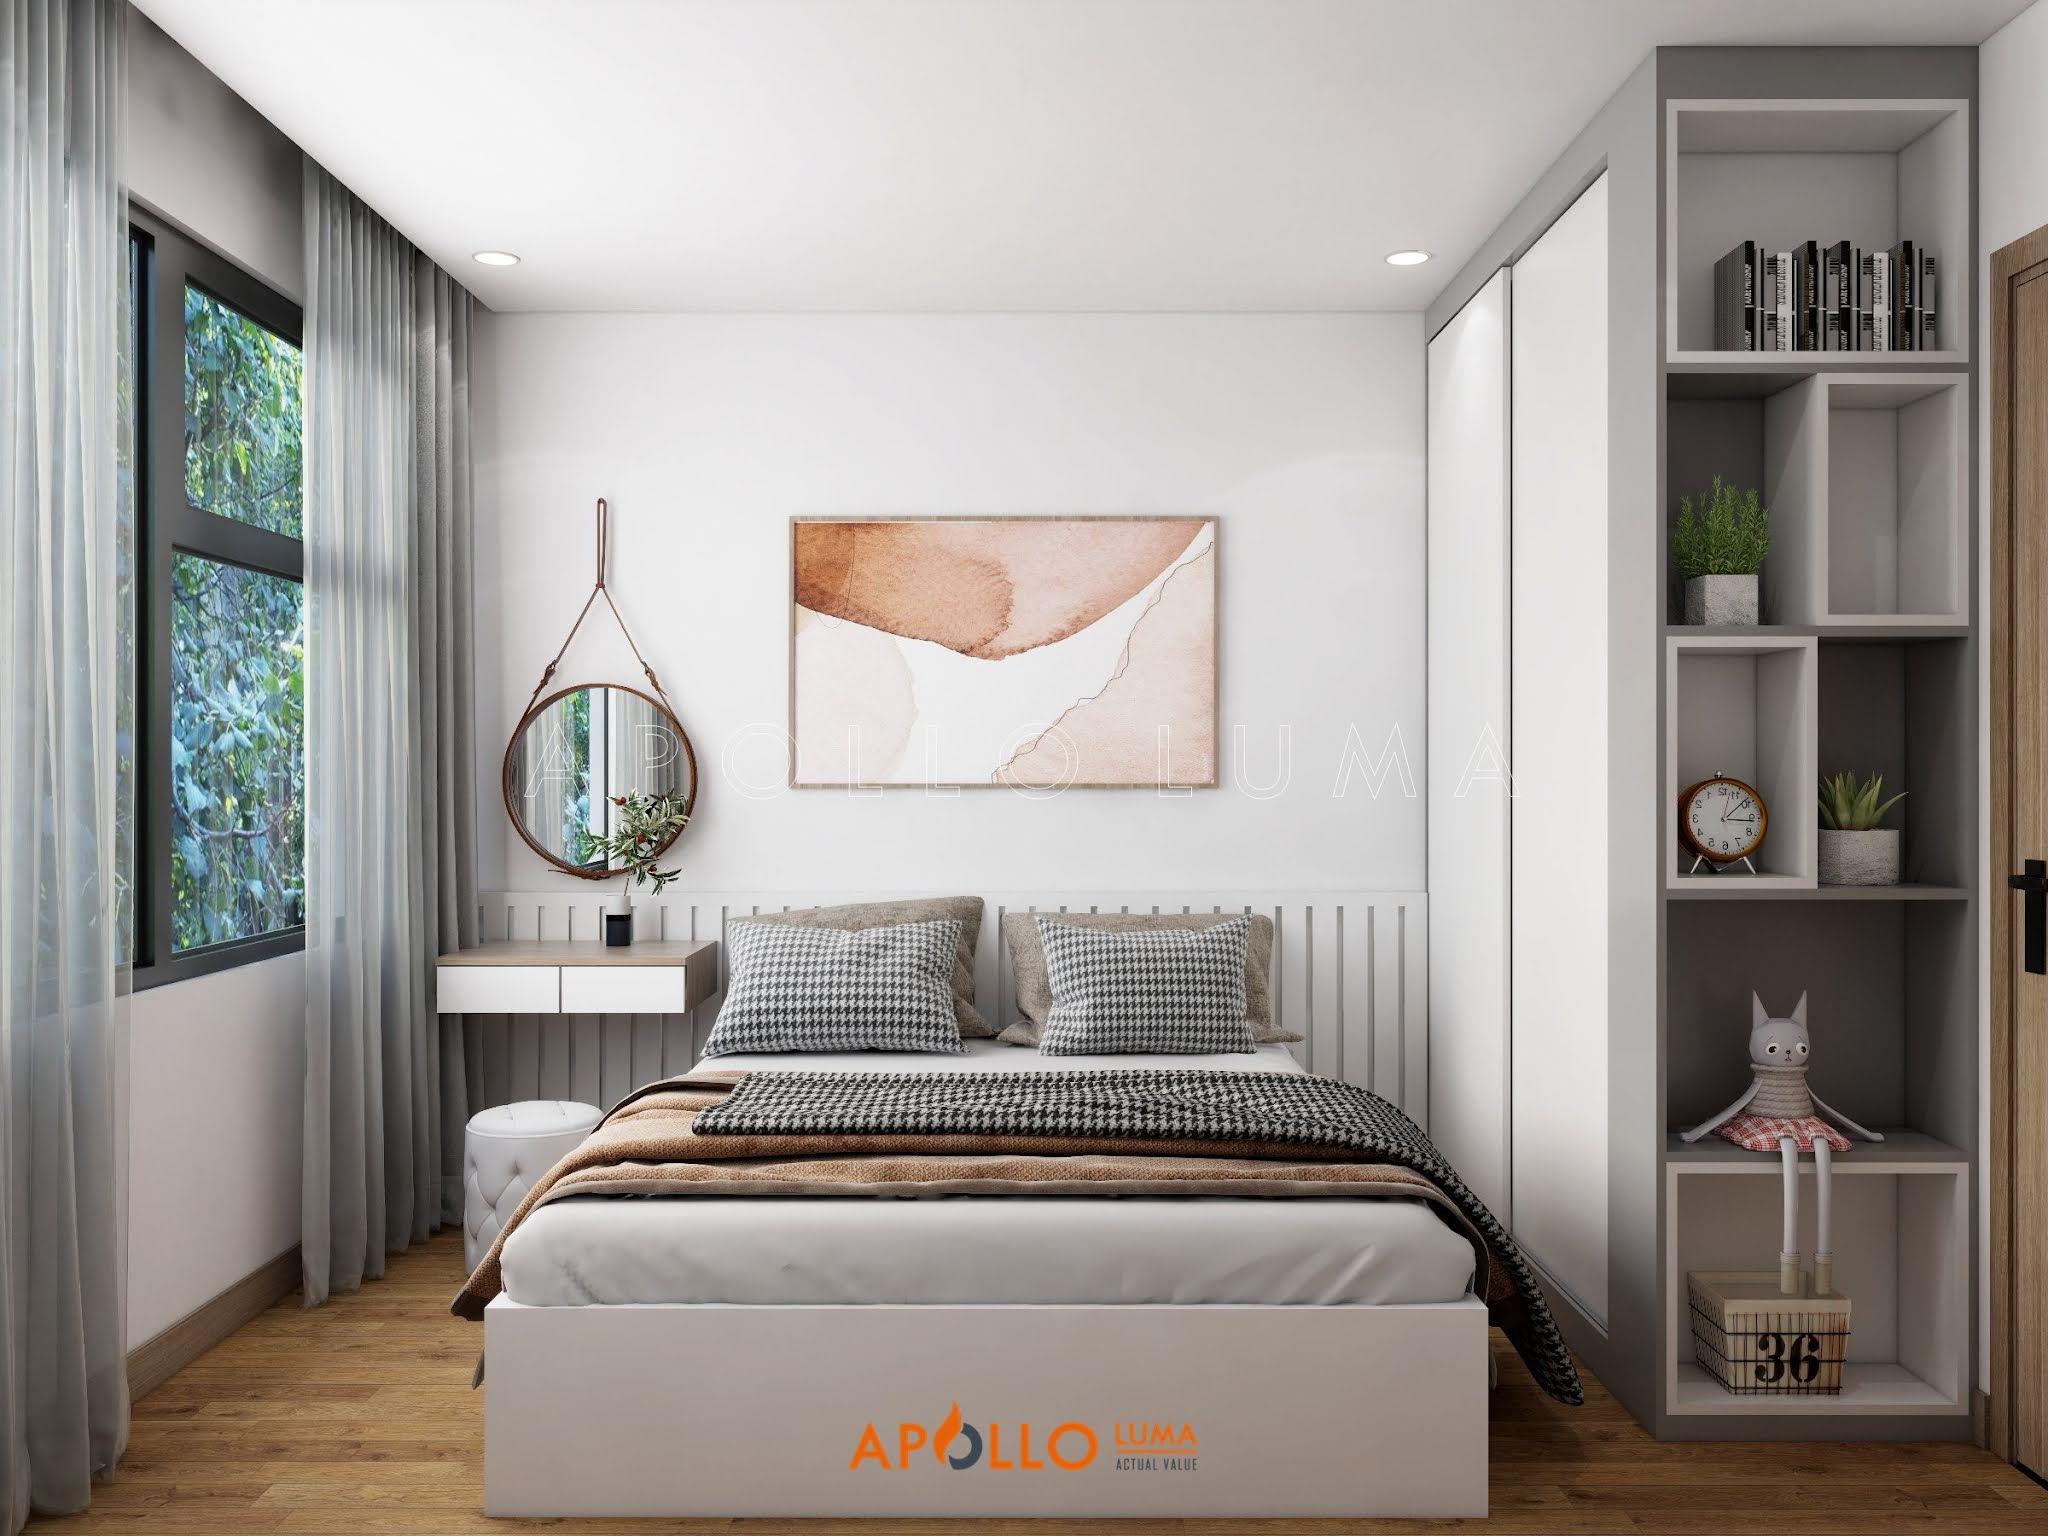 Thiết kế nội thất căn hộ 1PN+1 Vinhomes Ocean Park